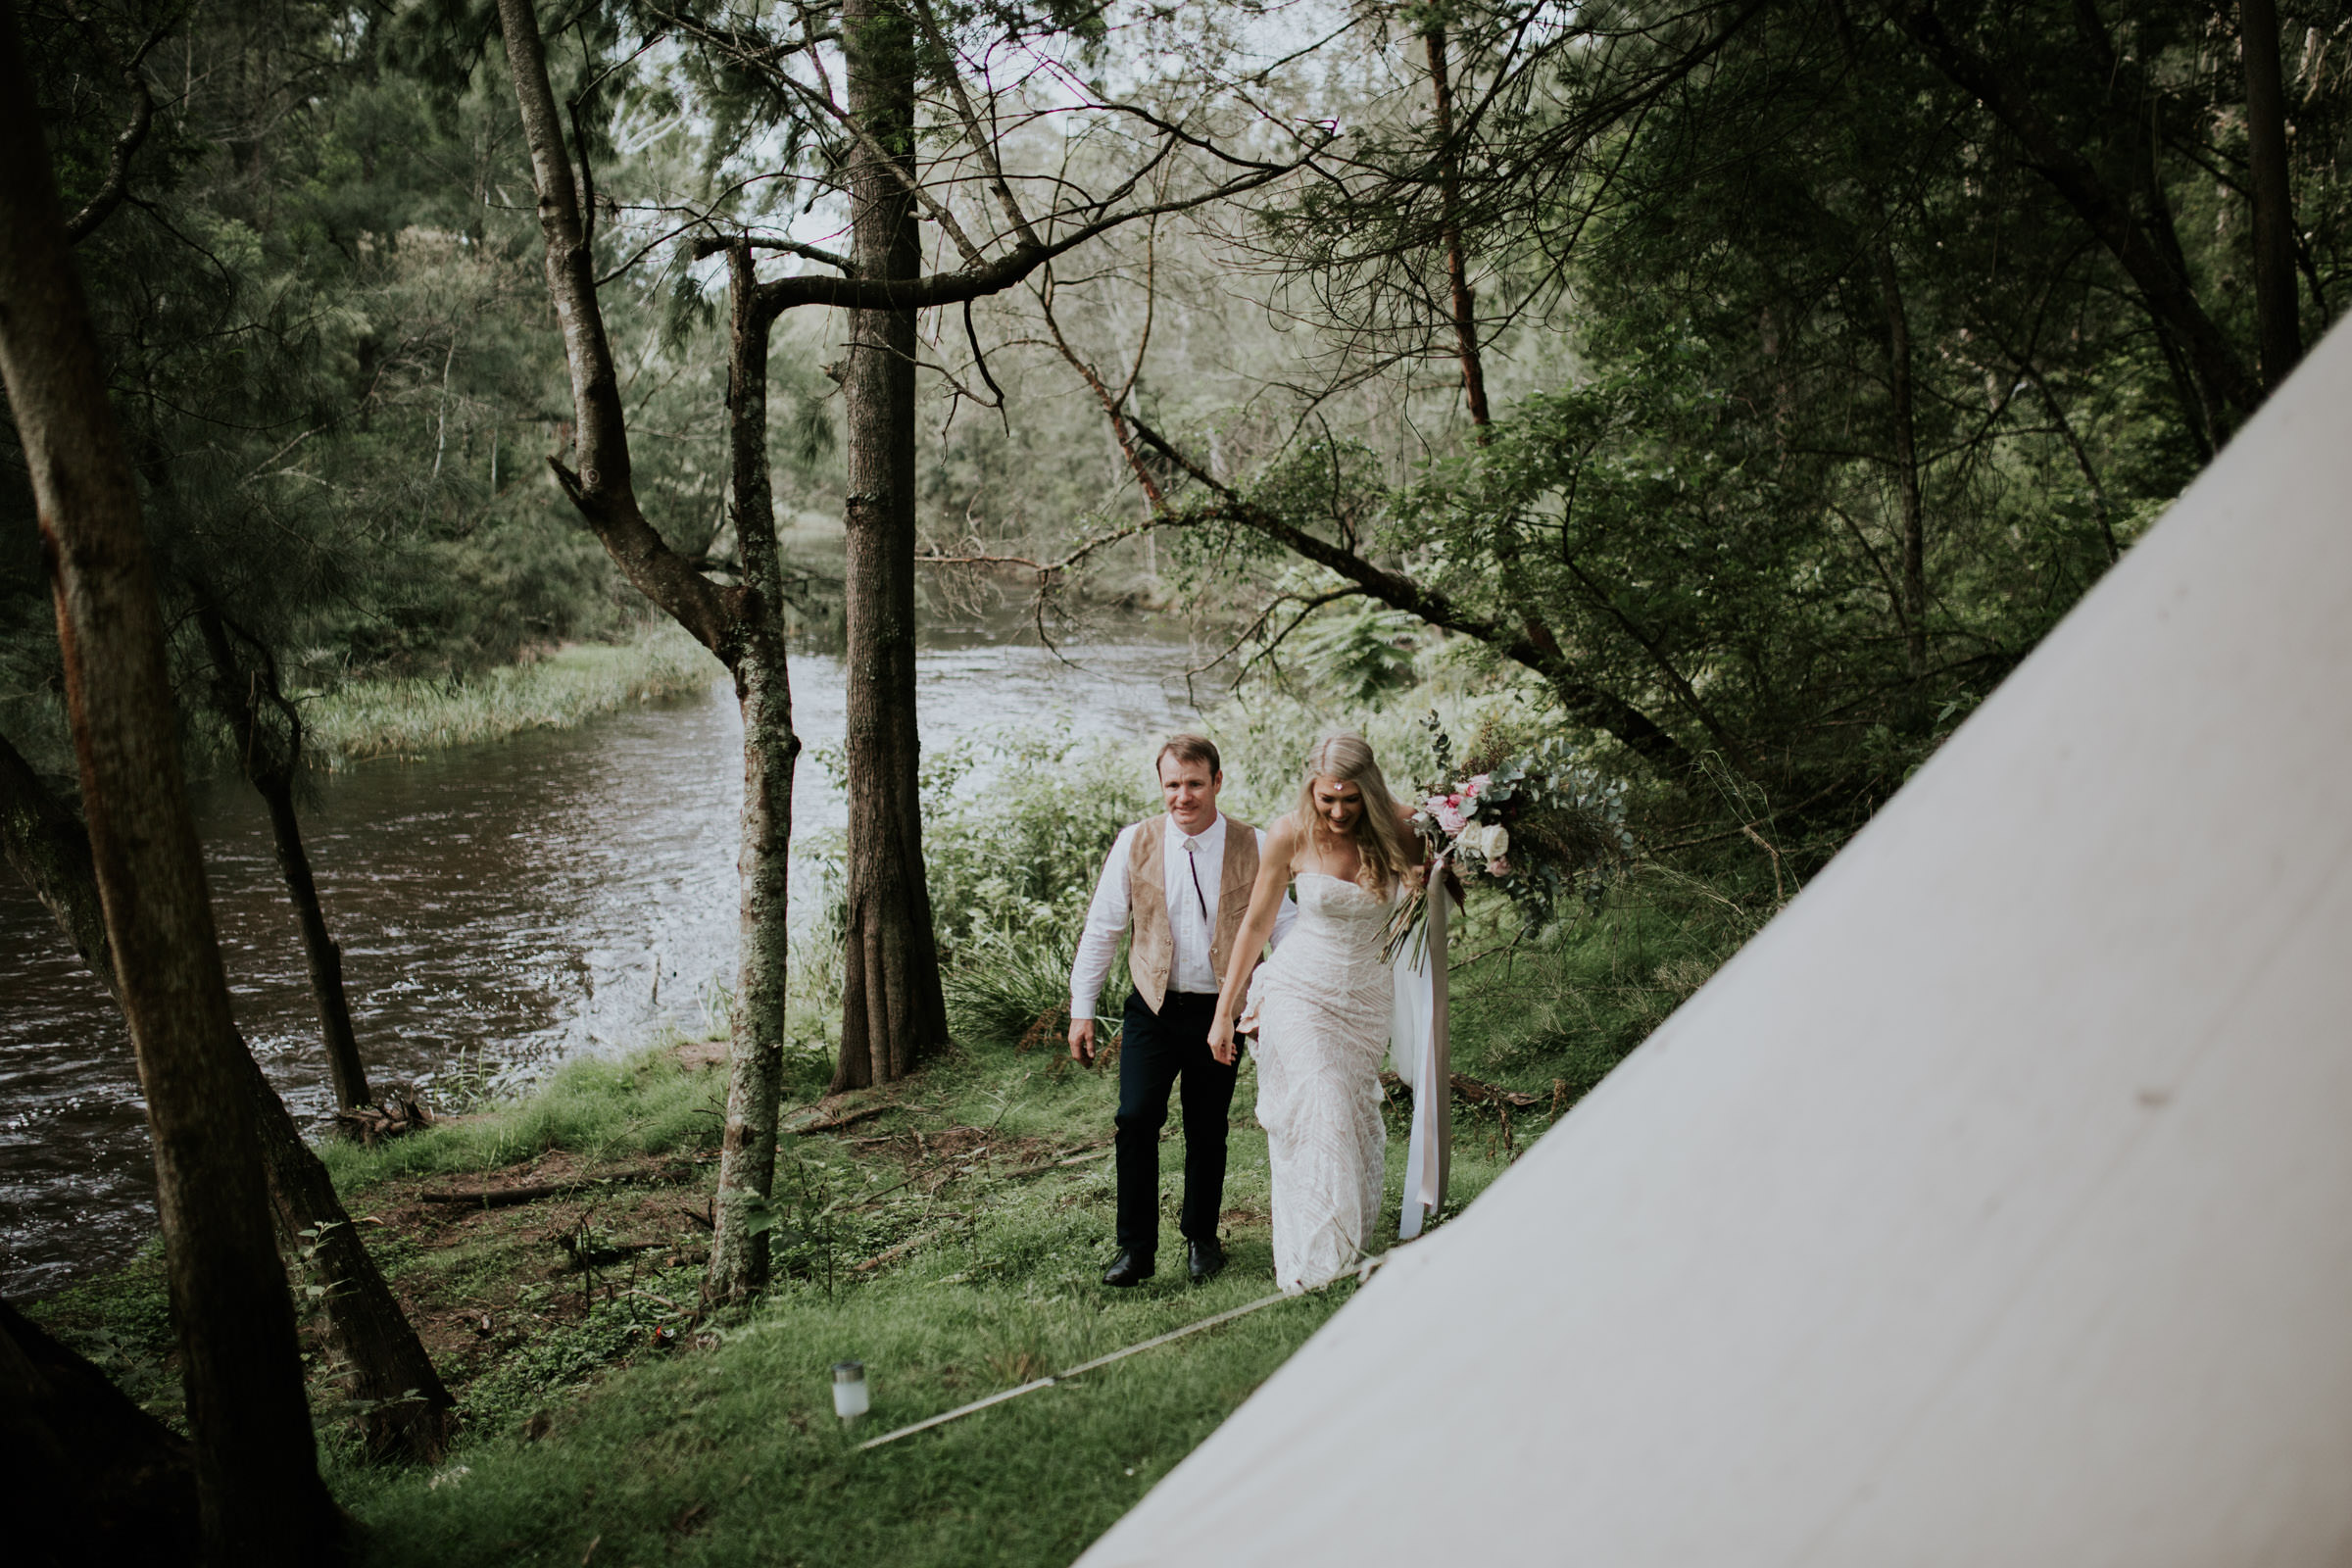 Emma+John+Far+South+Coast+Wedding+Festivl+Glamping+Bush-123.jpg